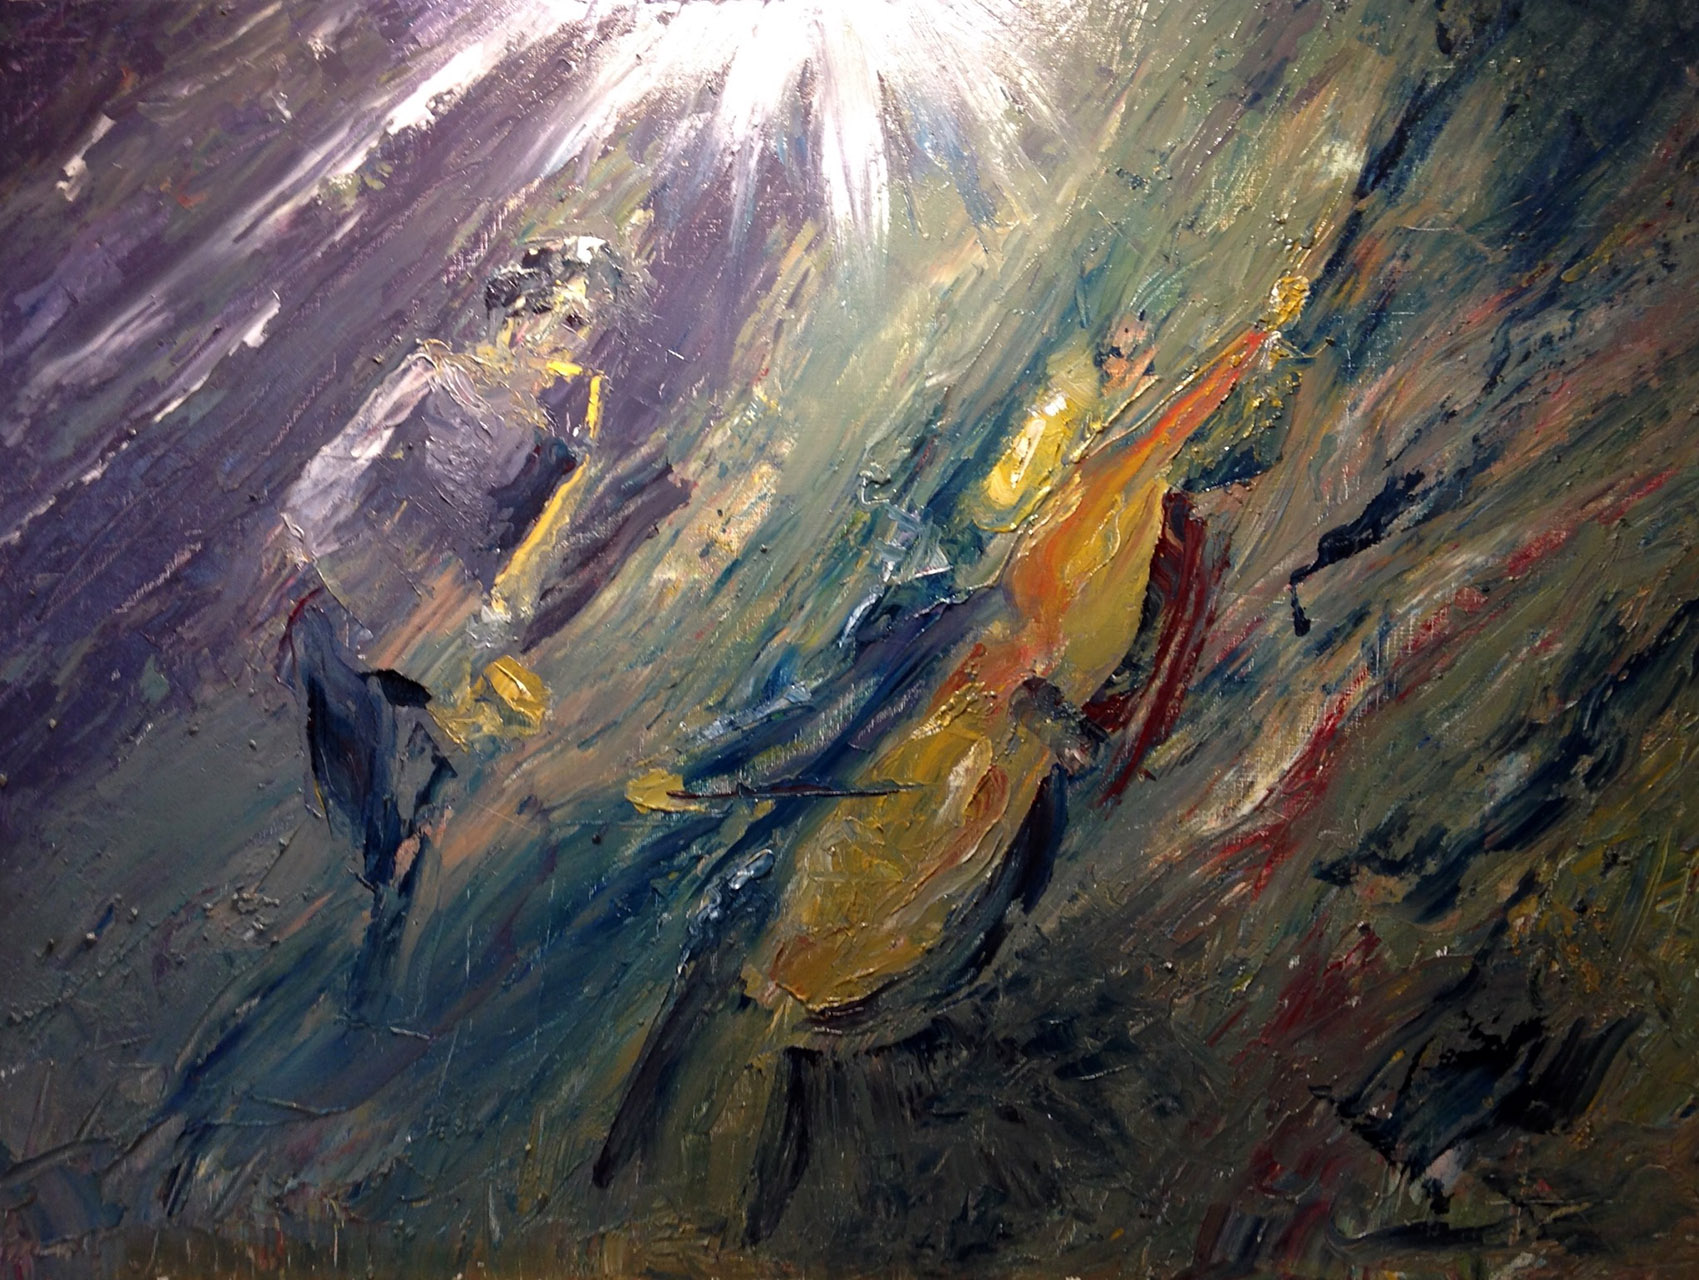 Dick van Tongeren_JamSession_Olieverf op canvaspaneel_30x25